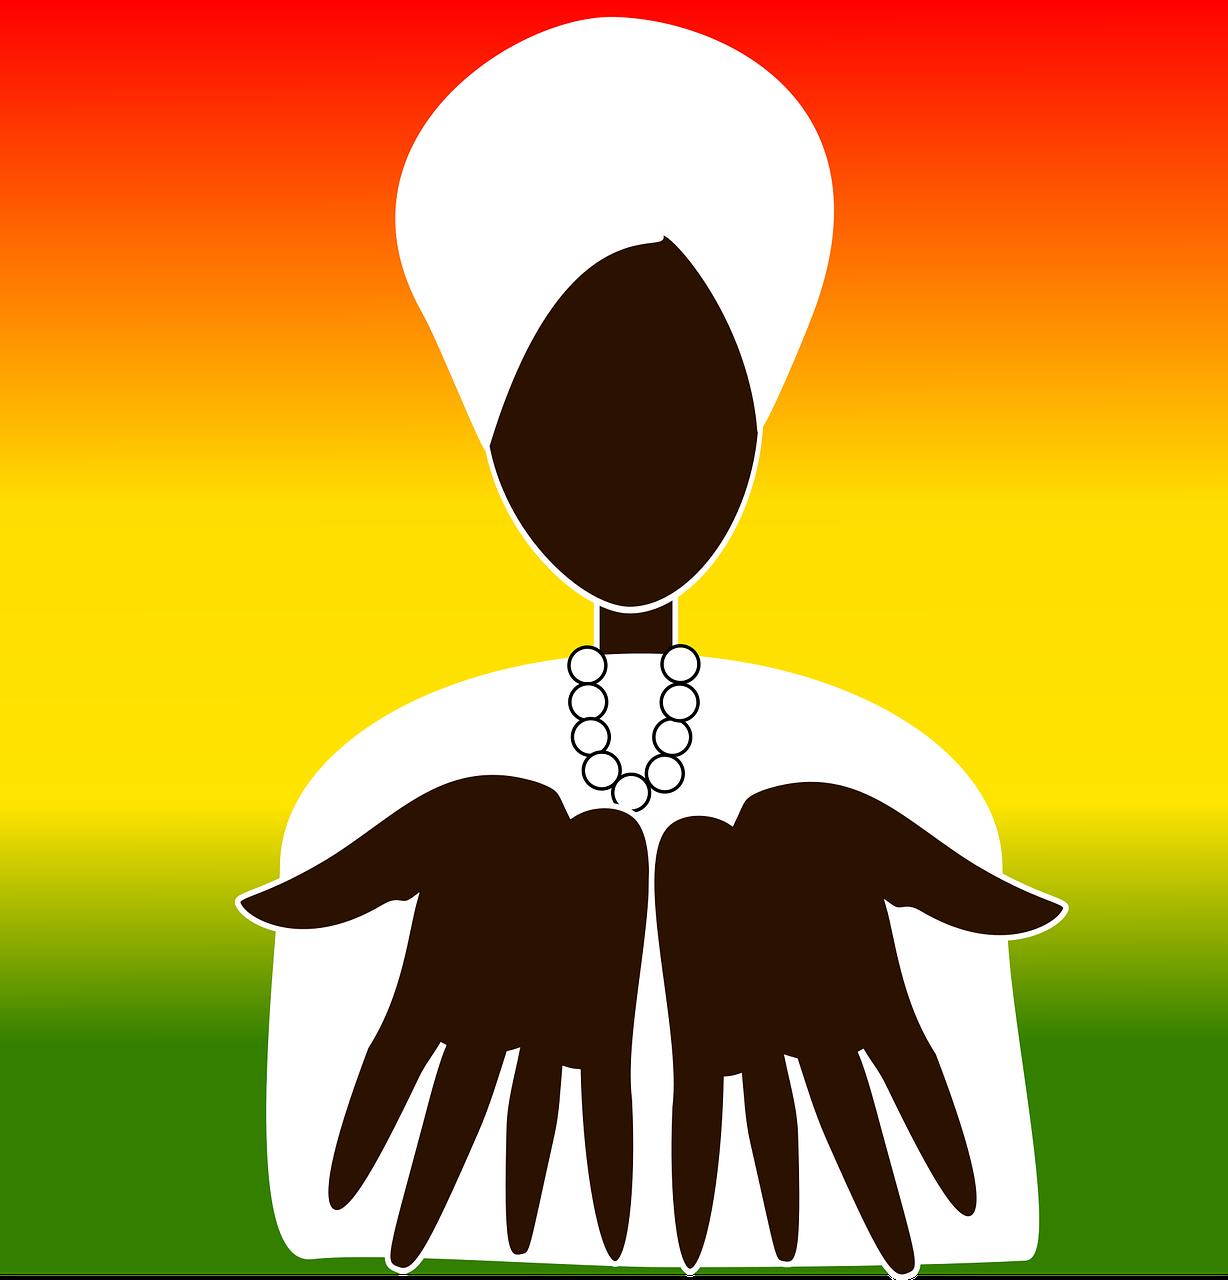 Fortuneteller Fortune Teller Free Vector Graphic On Pixabay